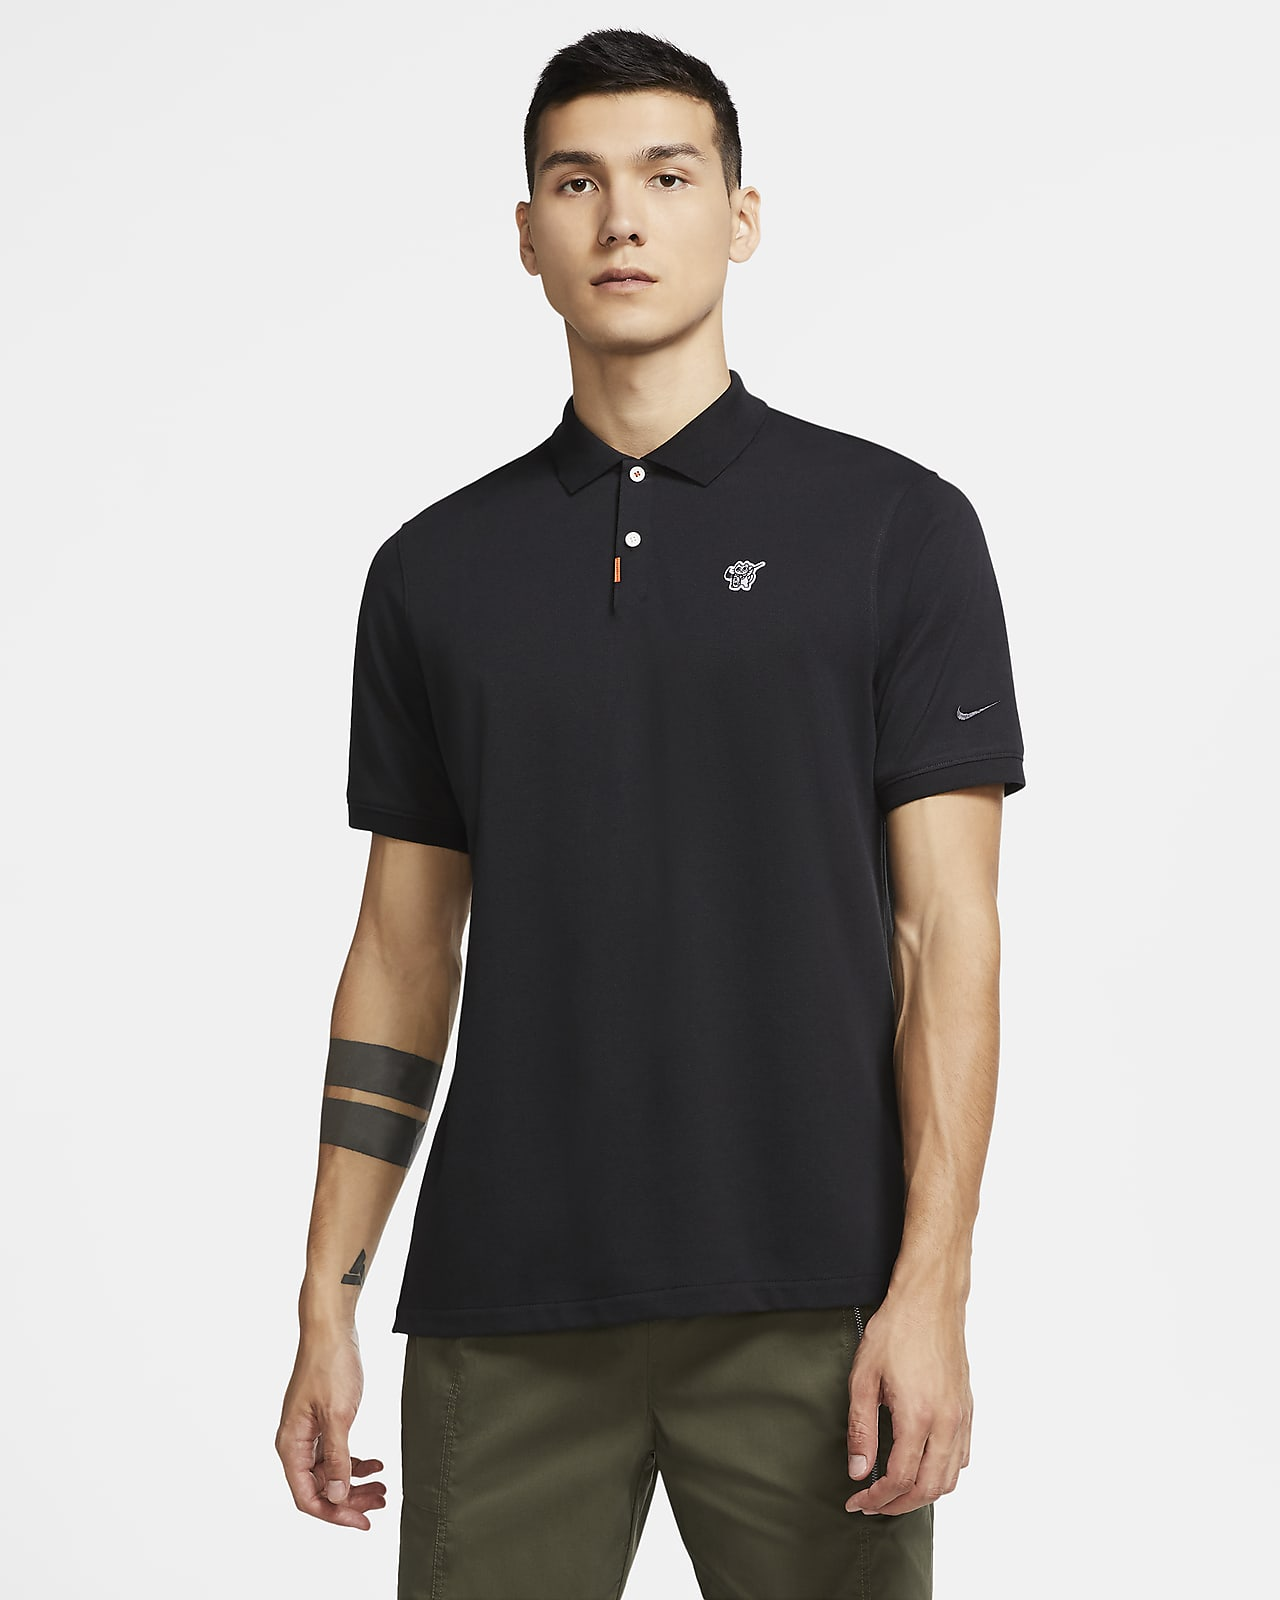 The Nike Polo Naomi Osaka Unisex Standard Fit Polo